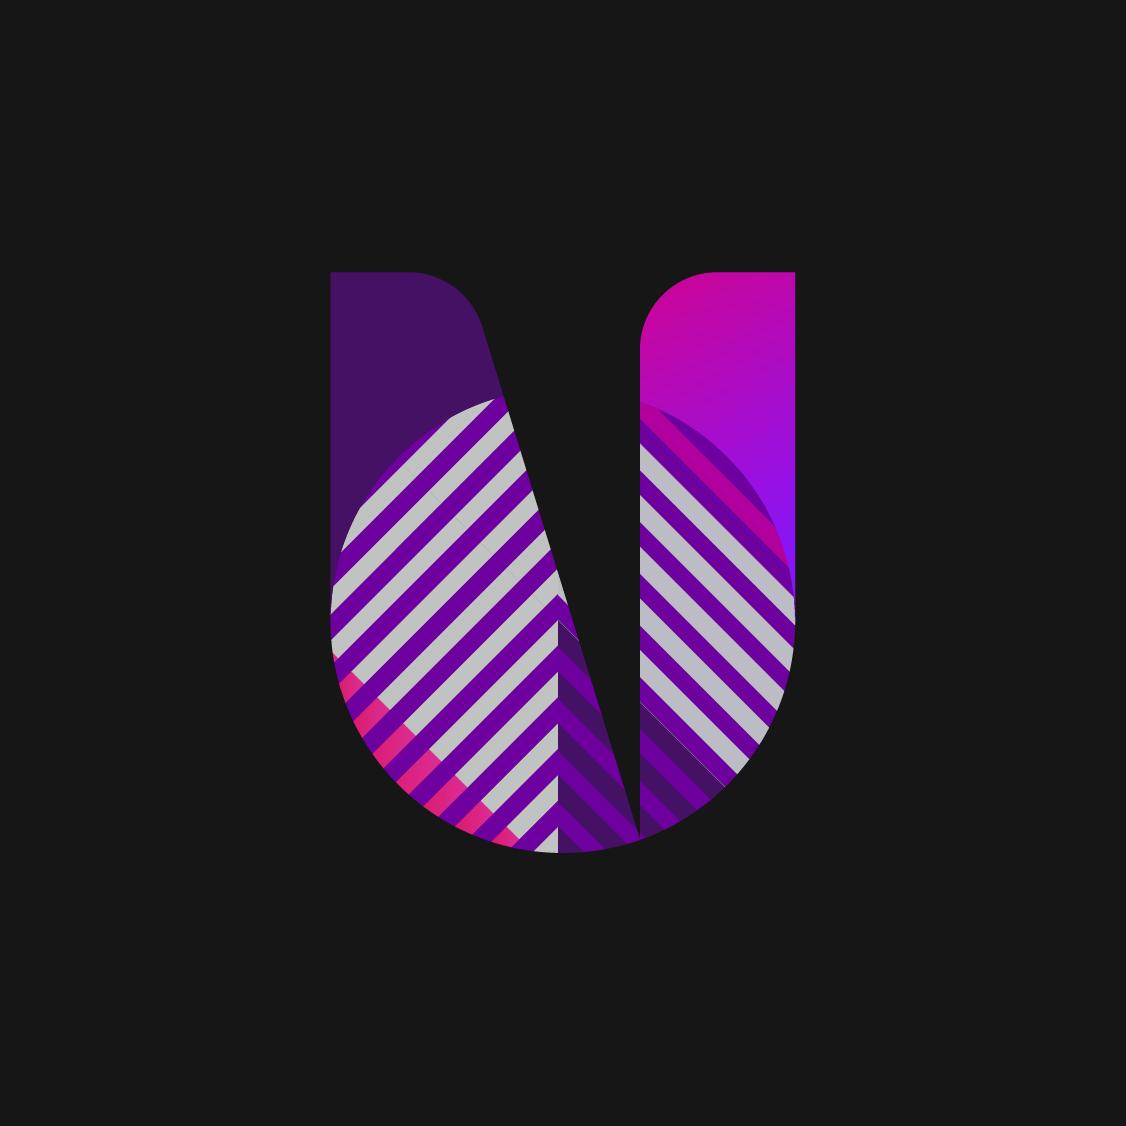 all-logos-2020-97